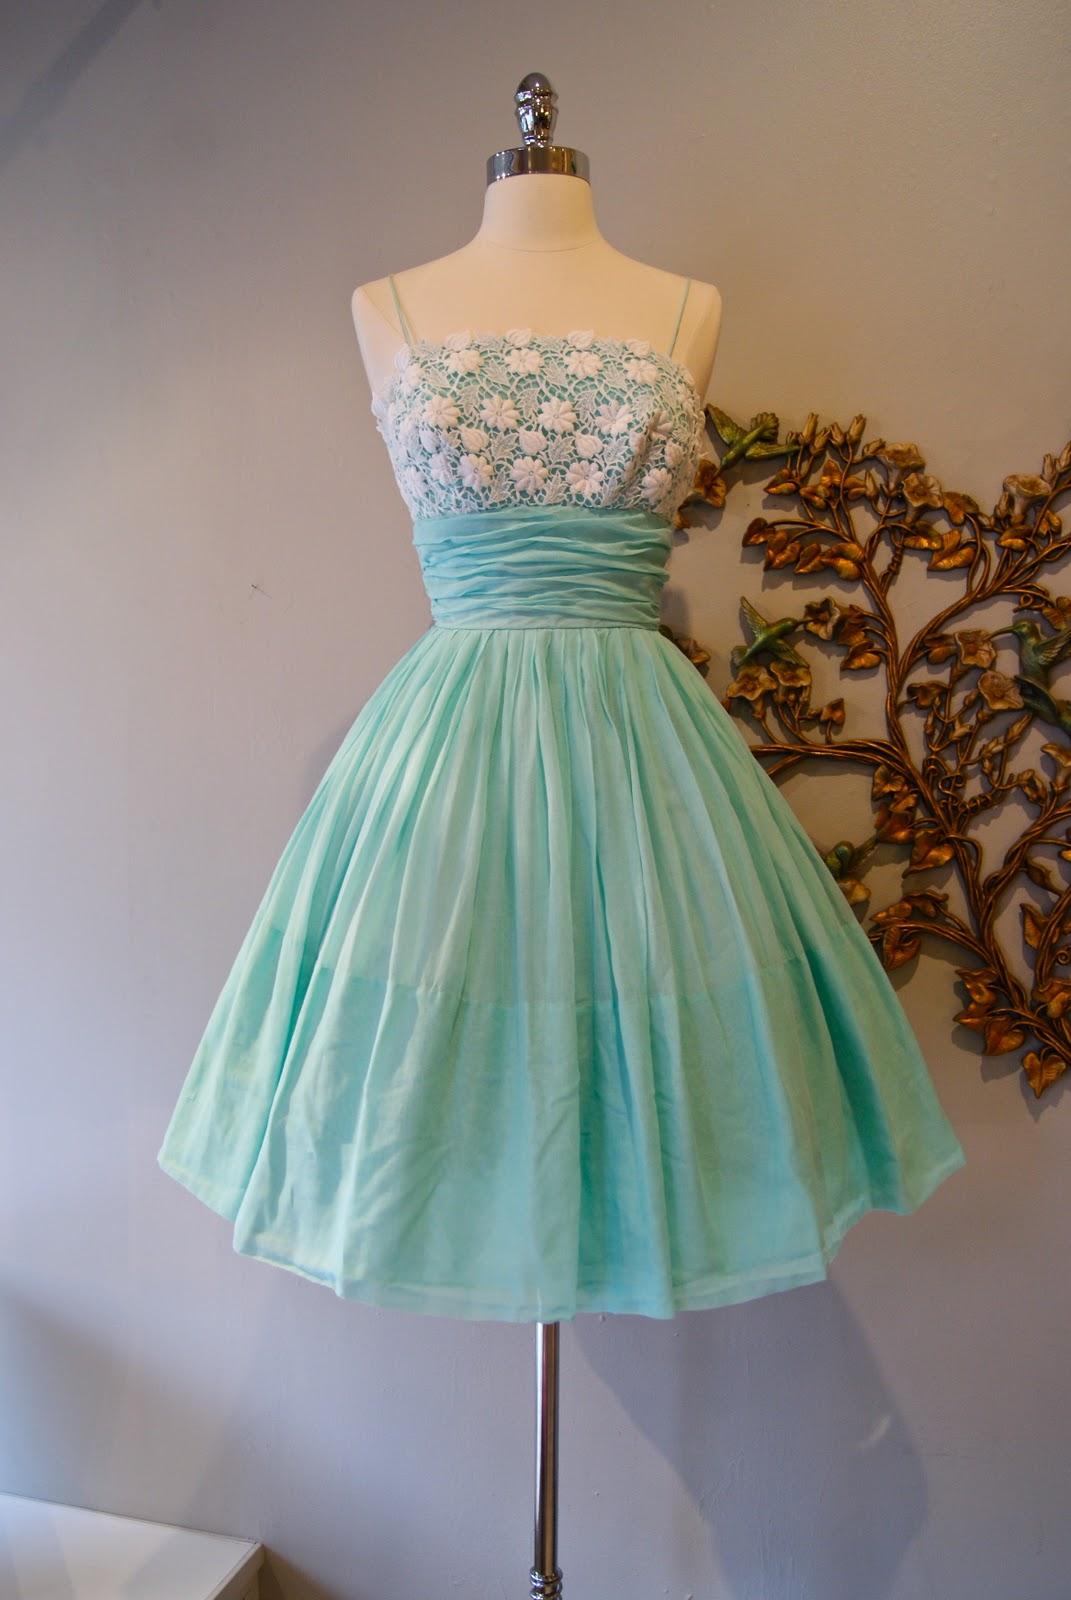 Xtabay Vintage Clothing Boutique - Portland, Oregon: Ice Cream Social